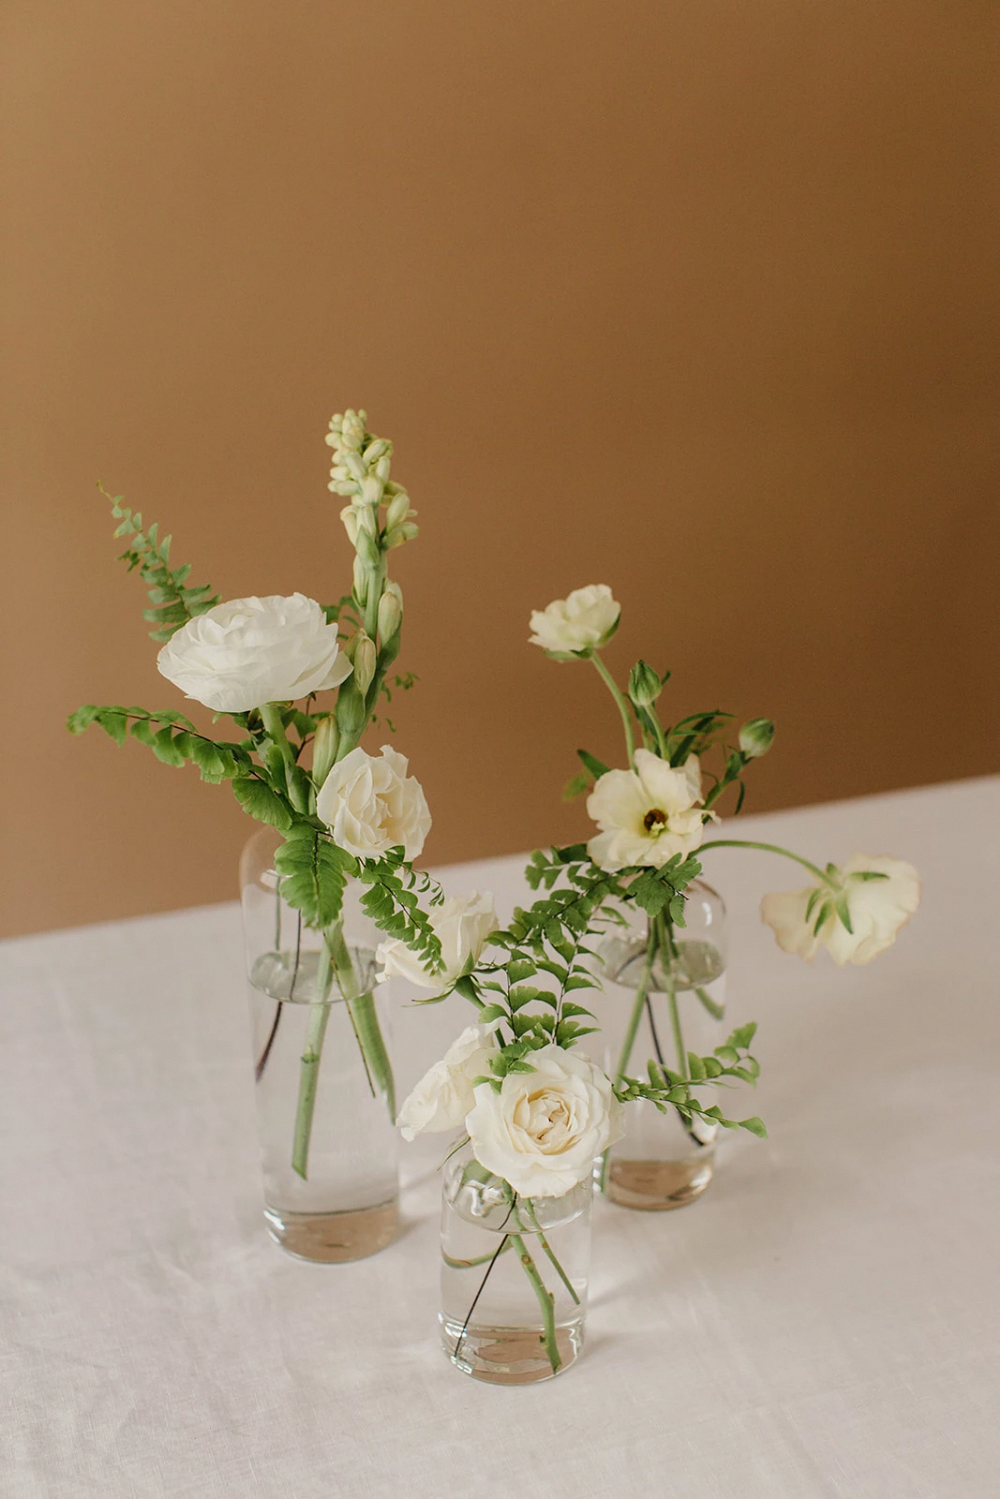 Romantic Fashioned Wedding Centerpiece Inexpensive Read More Articles Idee Per Matrimoni Idee Centrotavola